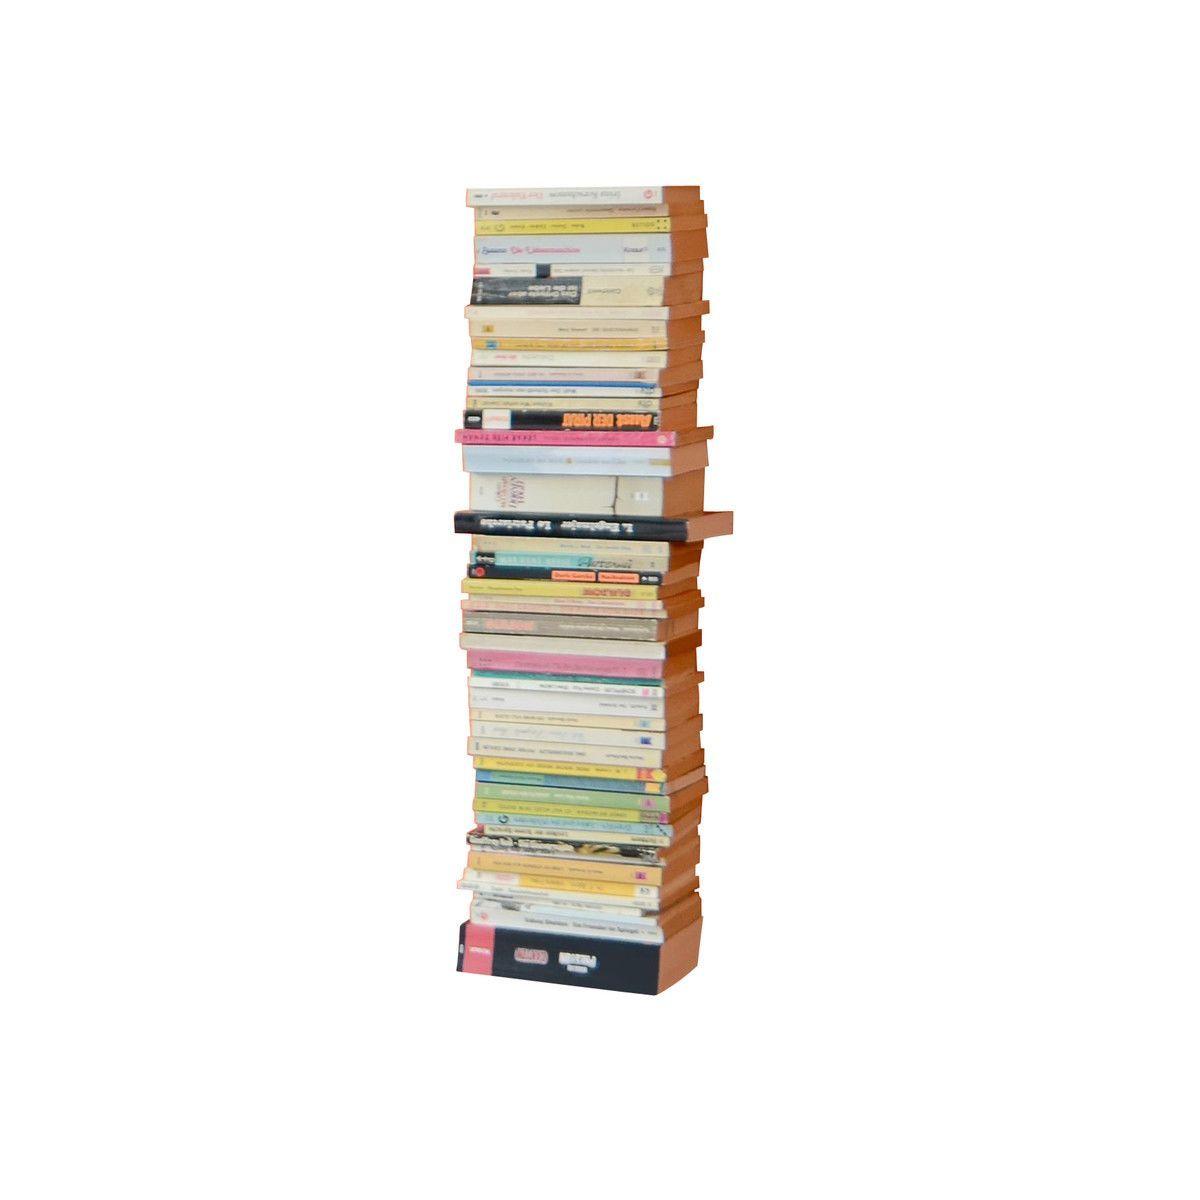 booksbaum wall shelf small radius. Black Bedroom Furniture Sets. Home Design Ideas